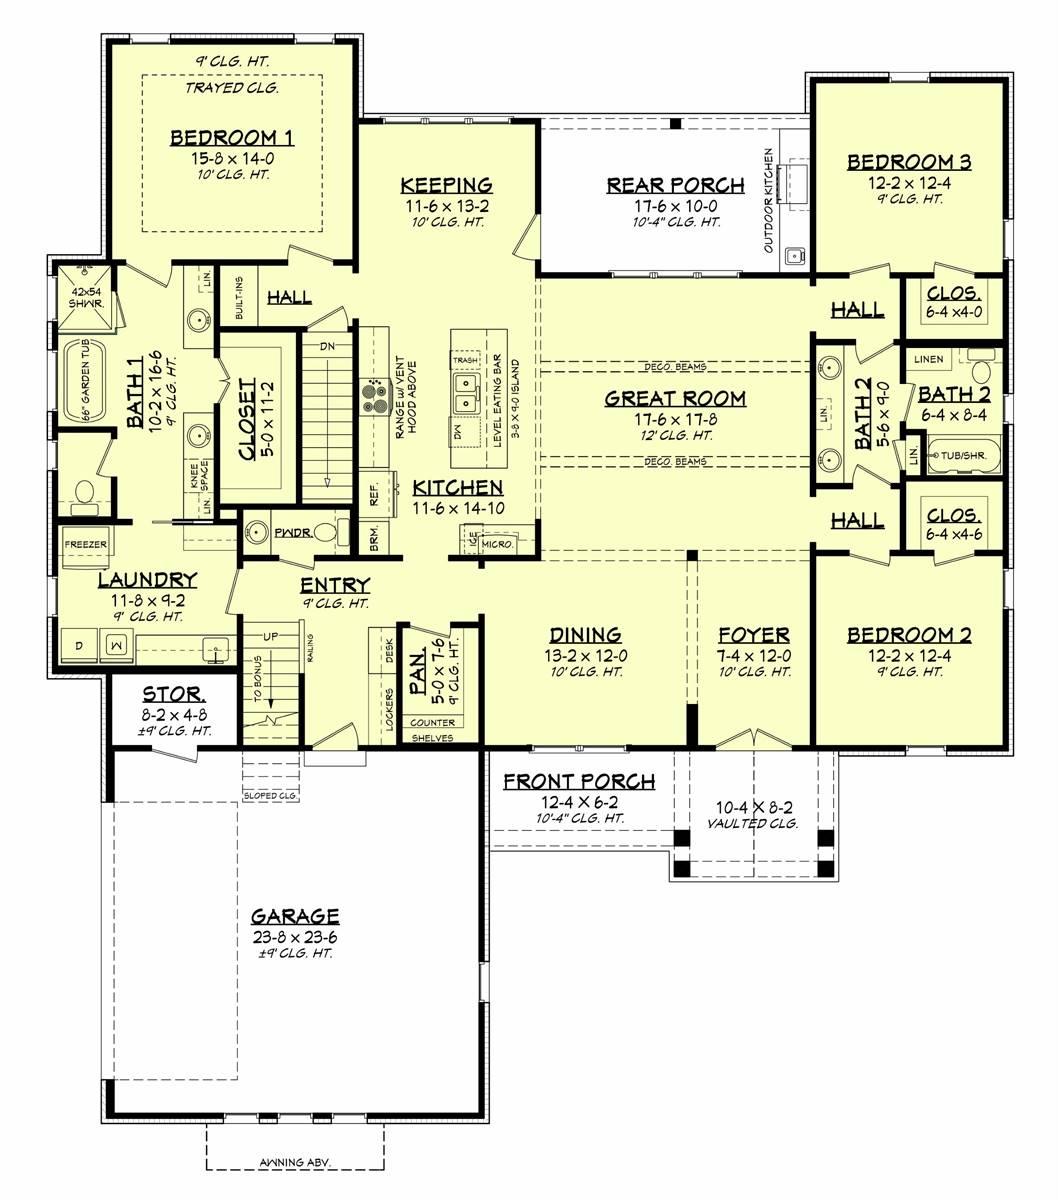 Basement Option Plan